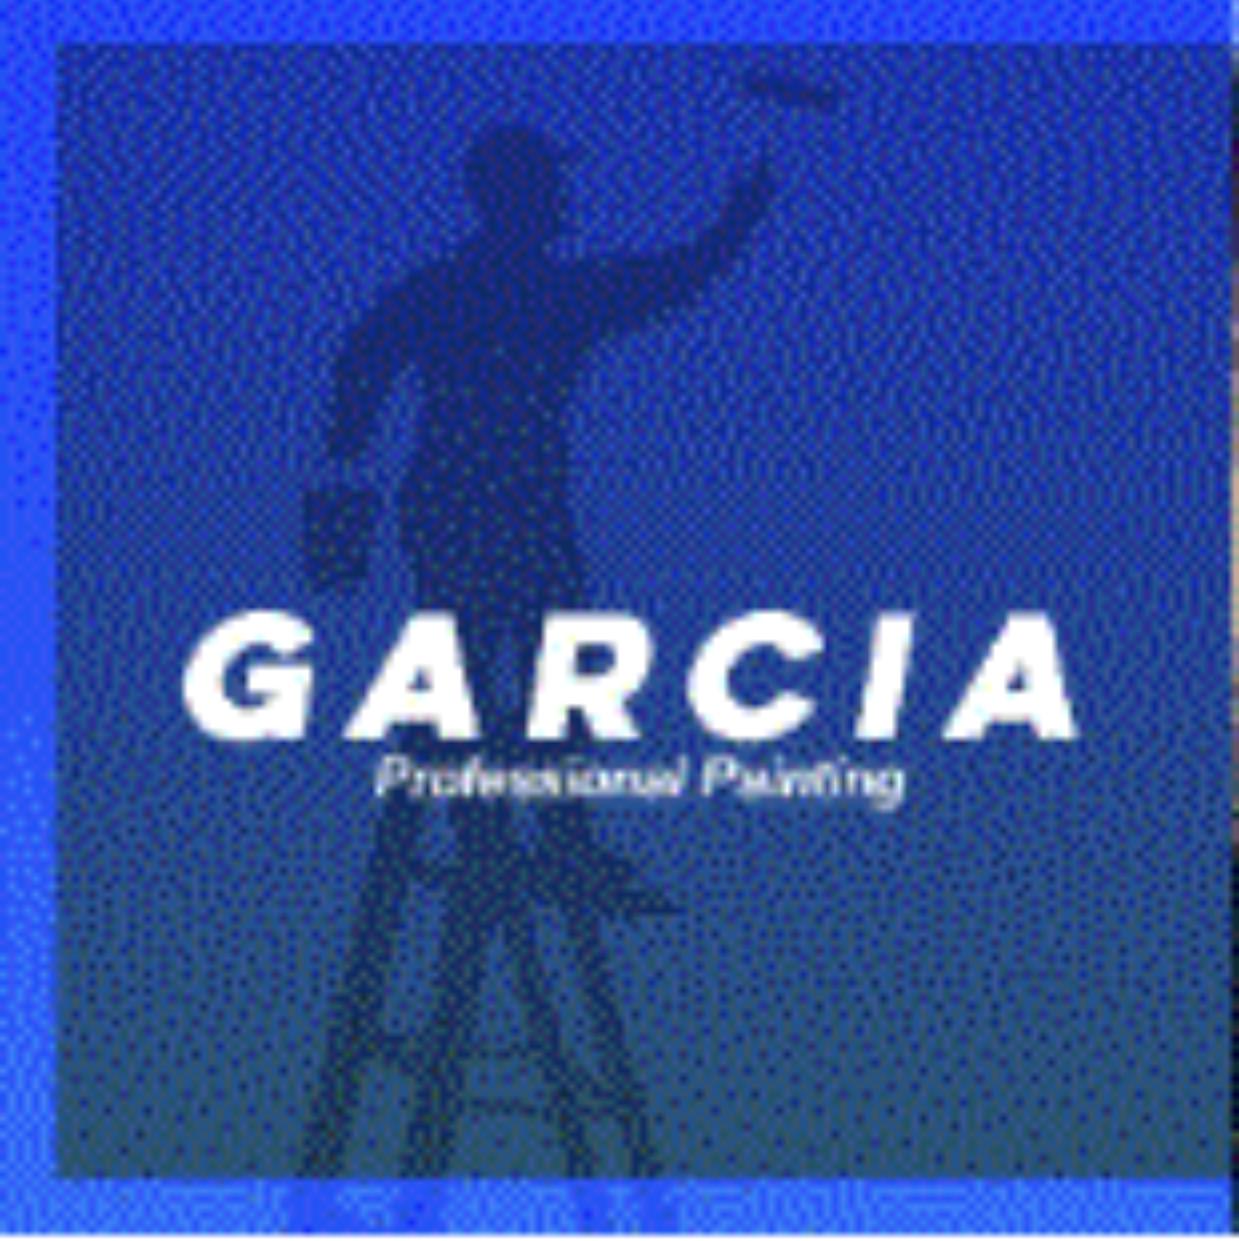 Garcia Professional Painting logo